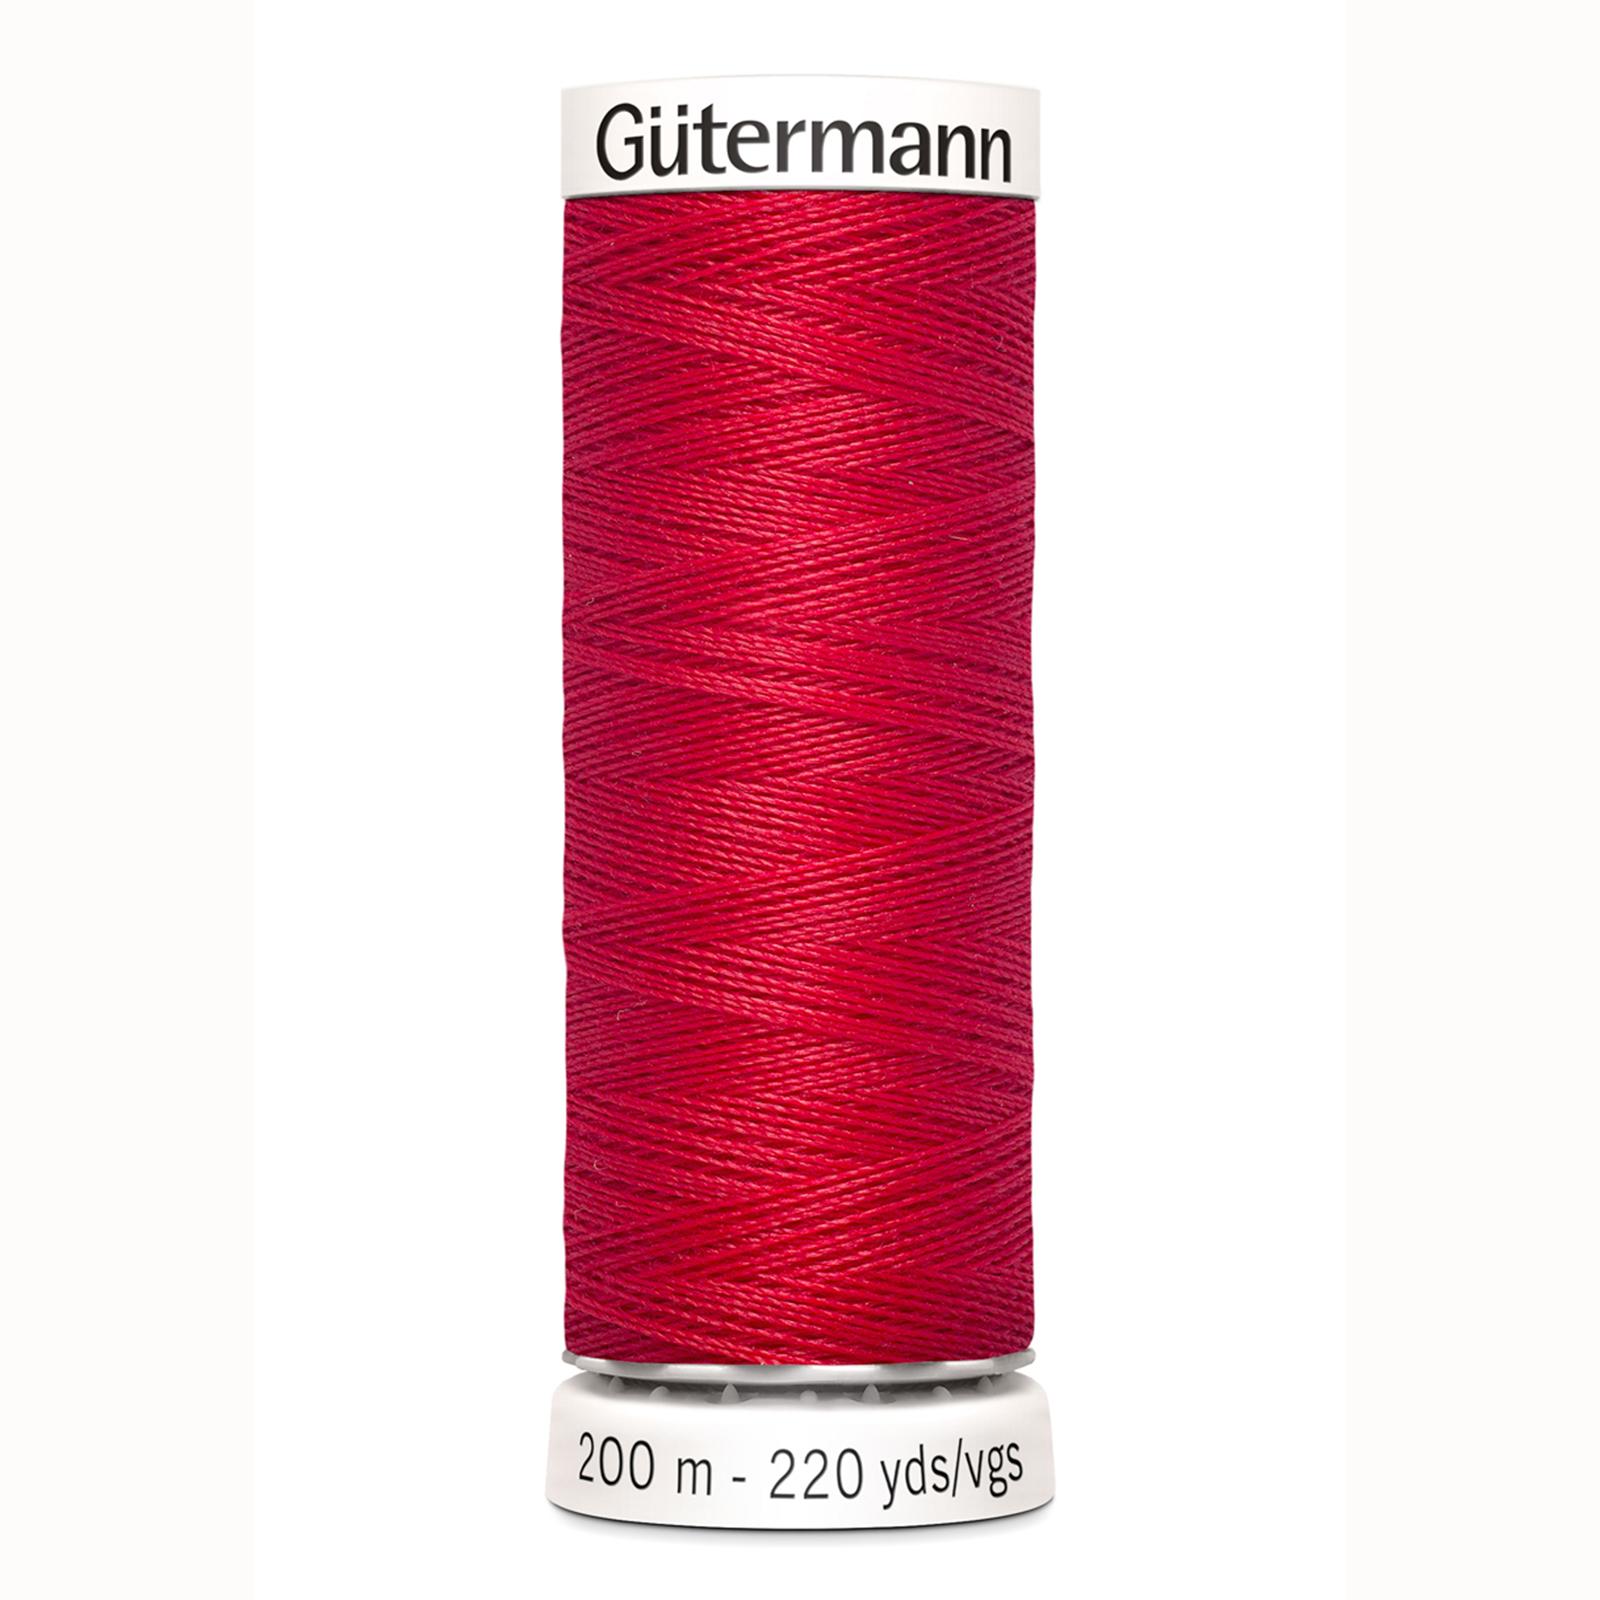 Gutermann Polyestr 200m-156